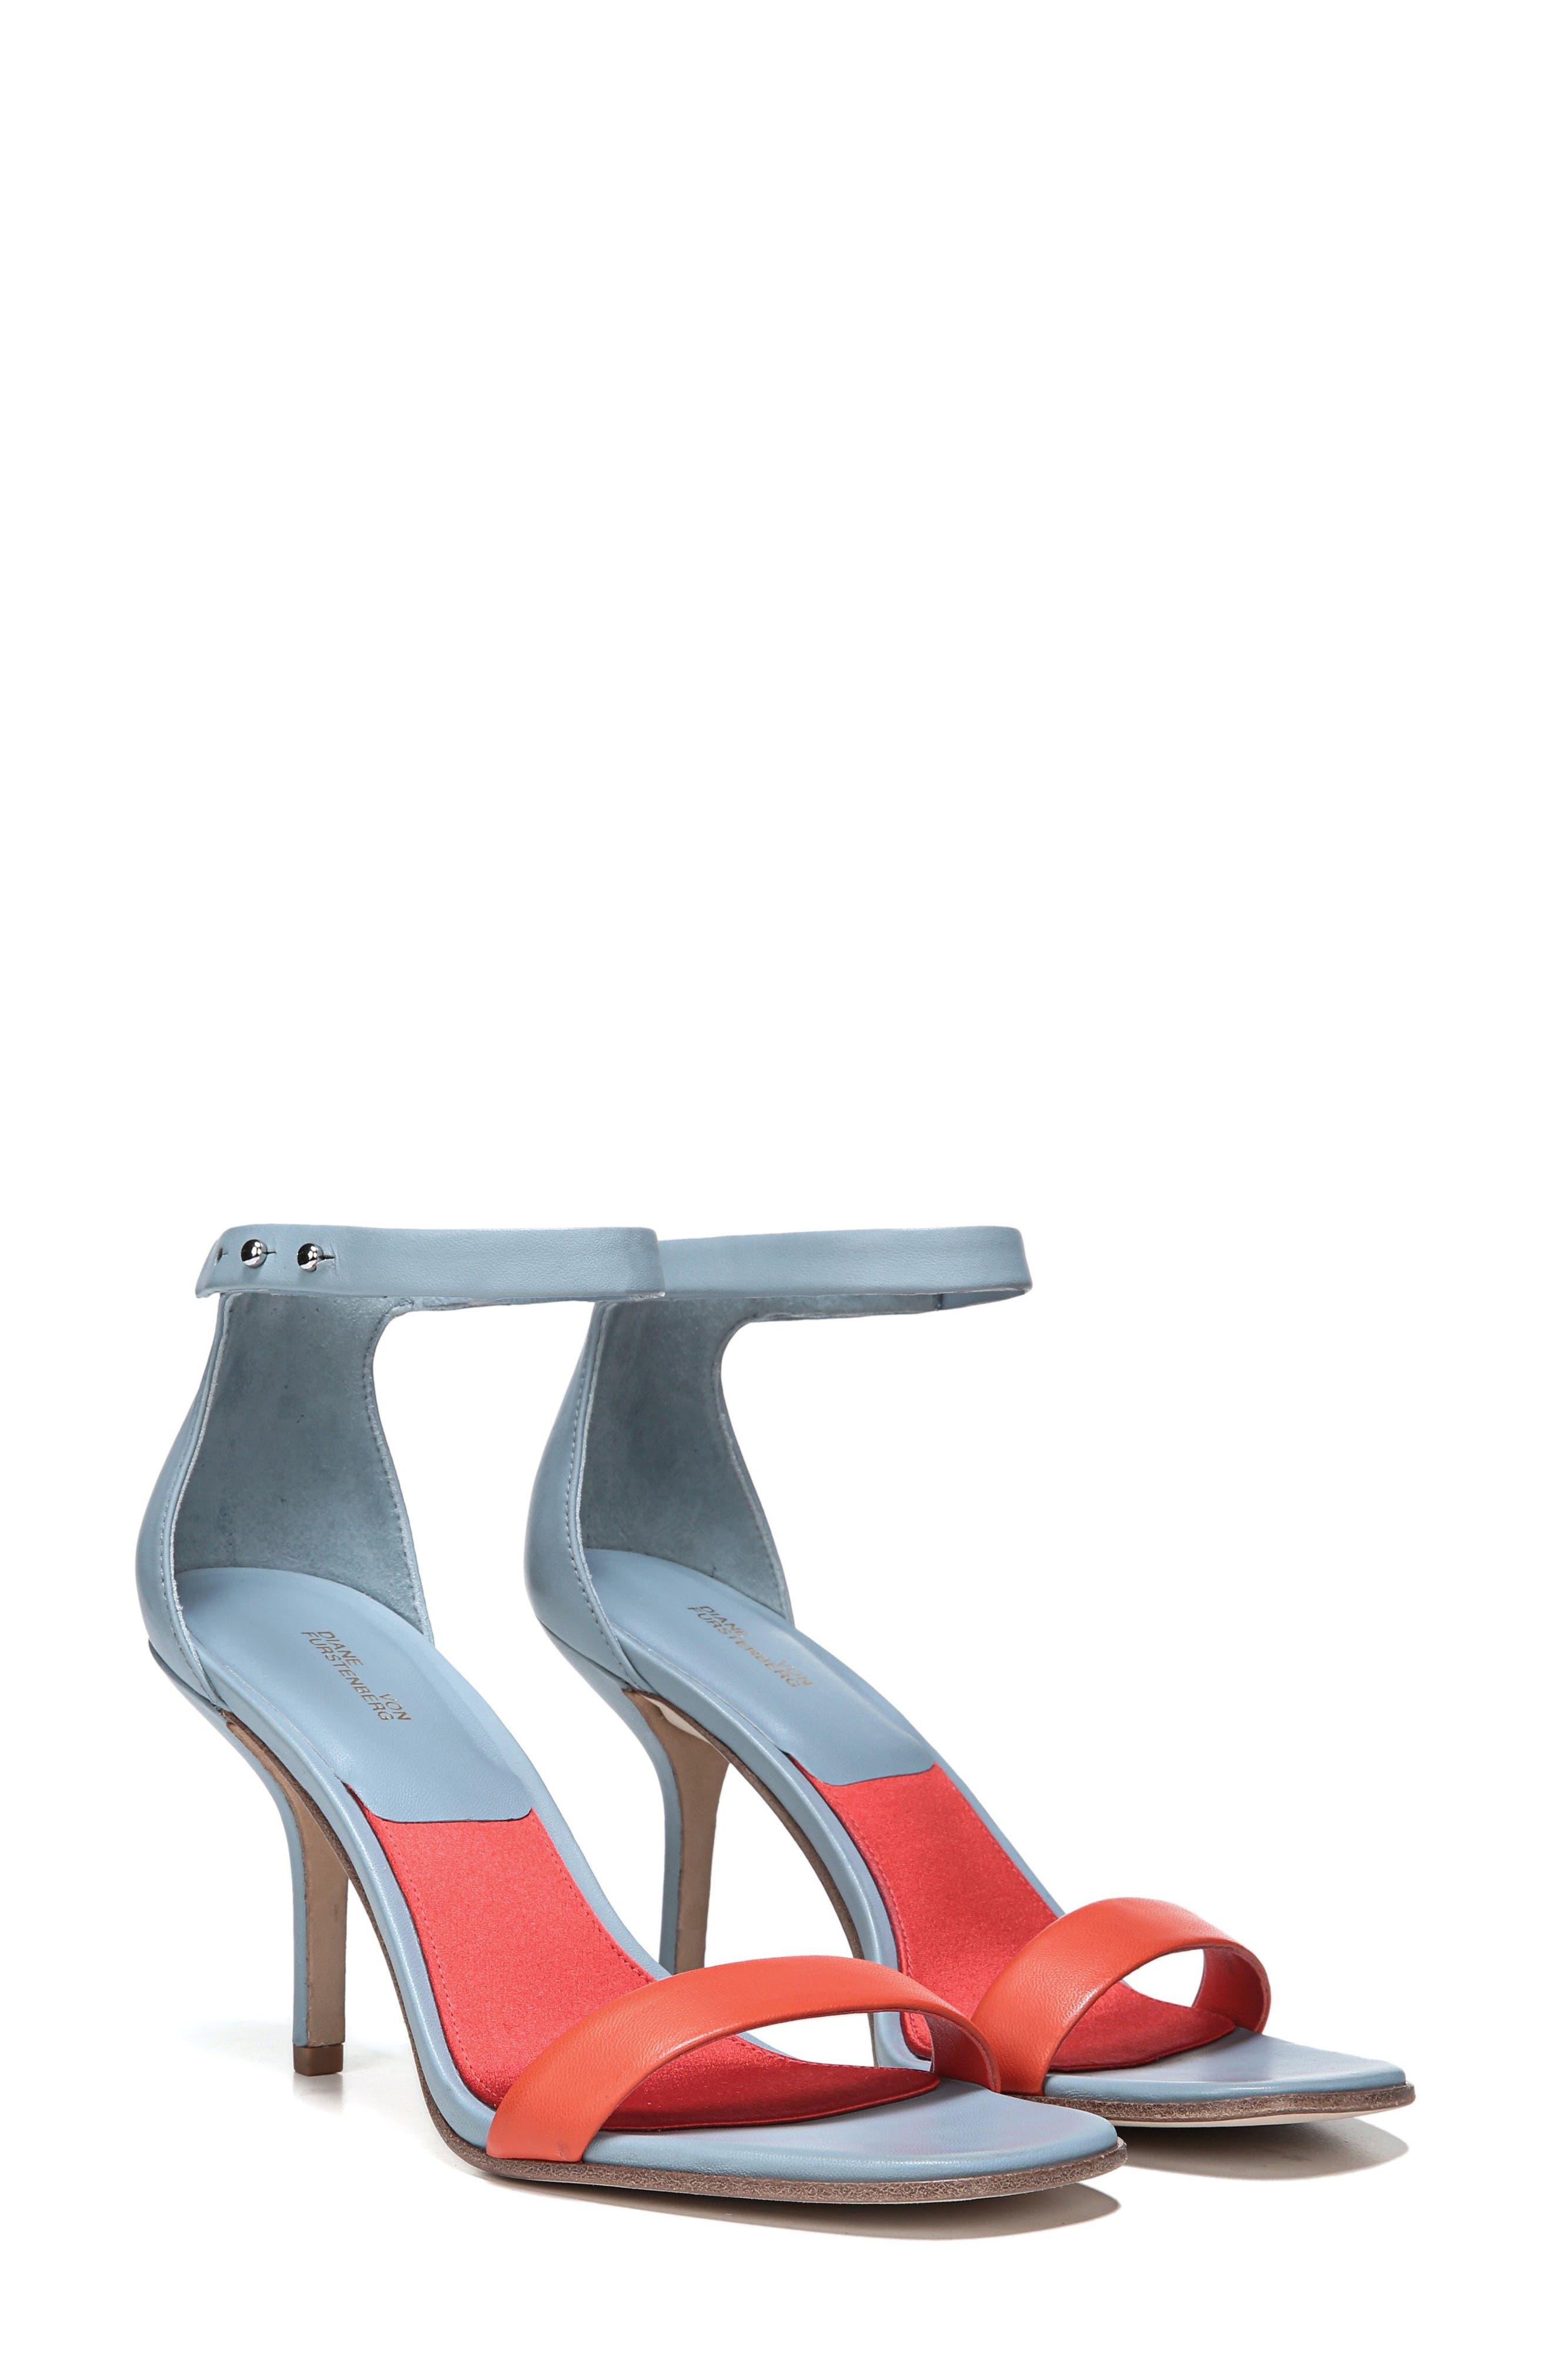 Ferrara Ankle Strap Sandal,                             Alternate thumbnail 20, color,